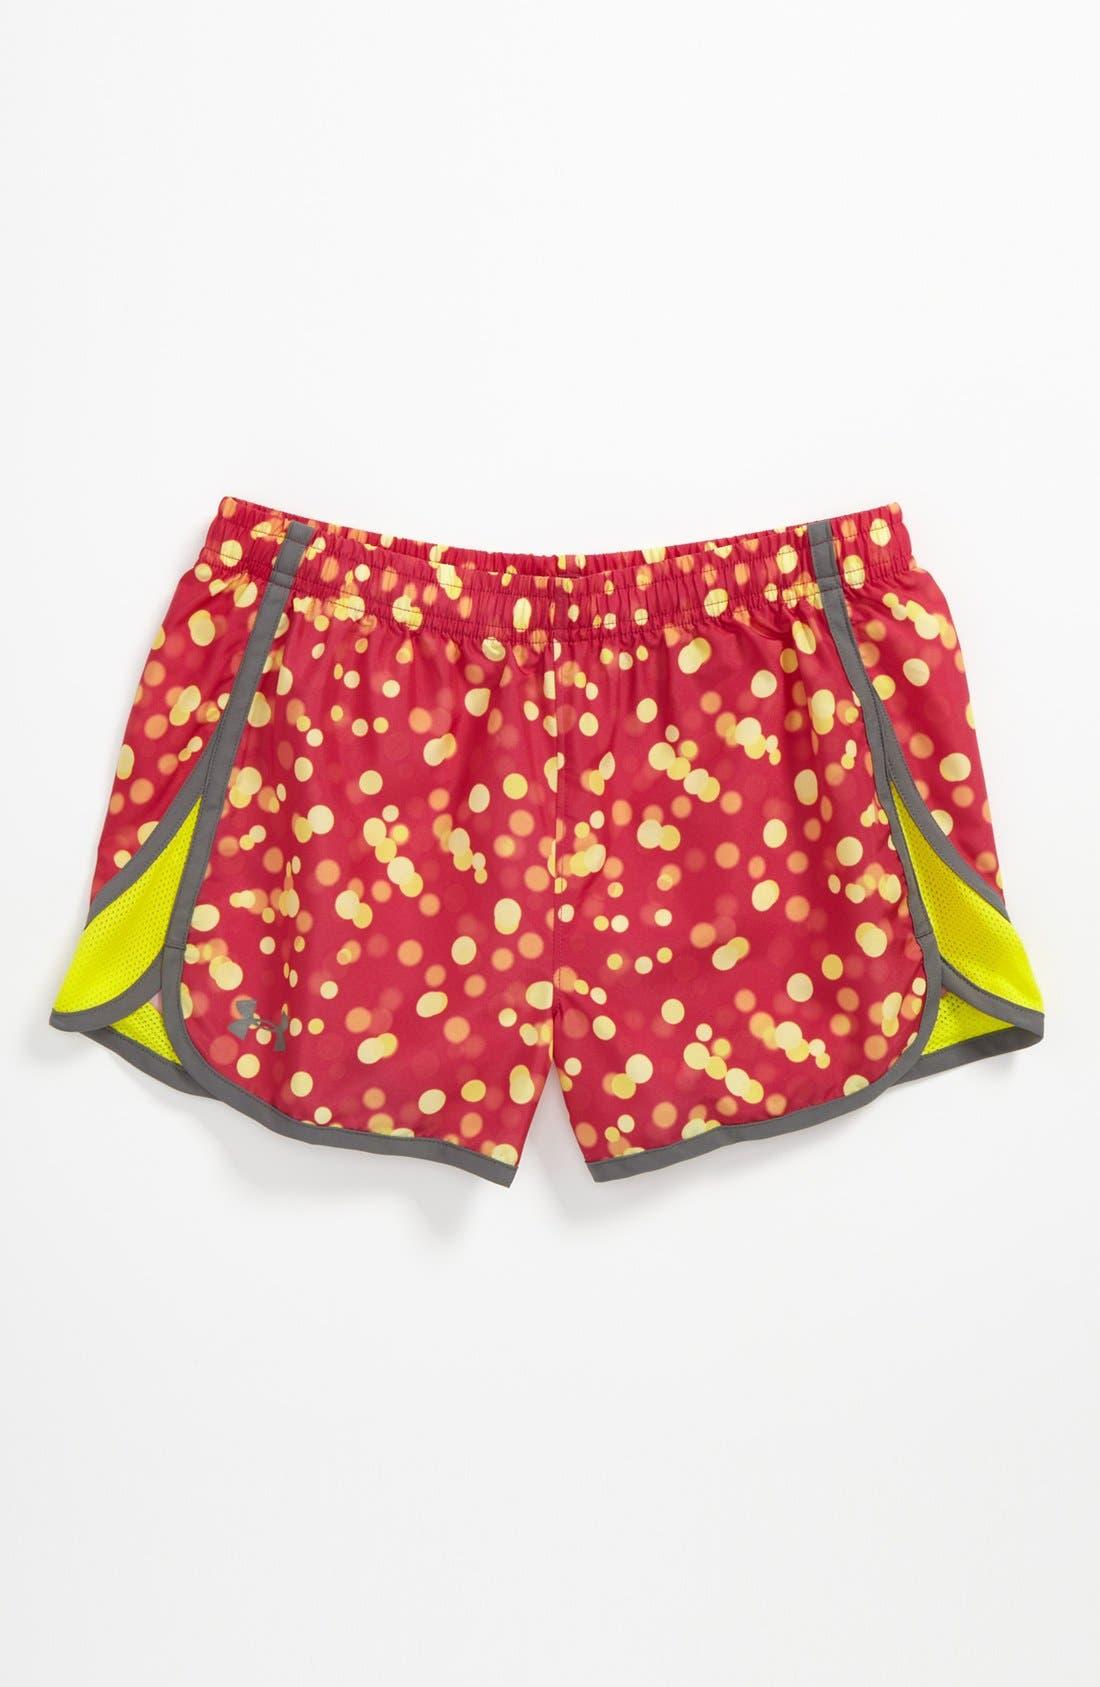 Main Image - Under Armour 'Escape' HeatGear® Print Shorts (Big Girls)